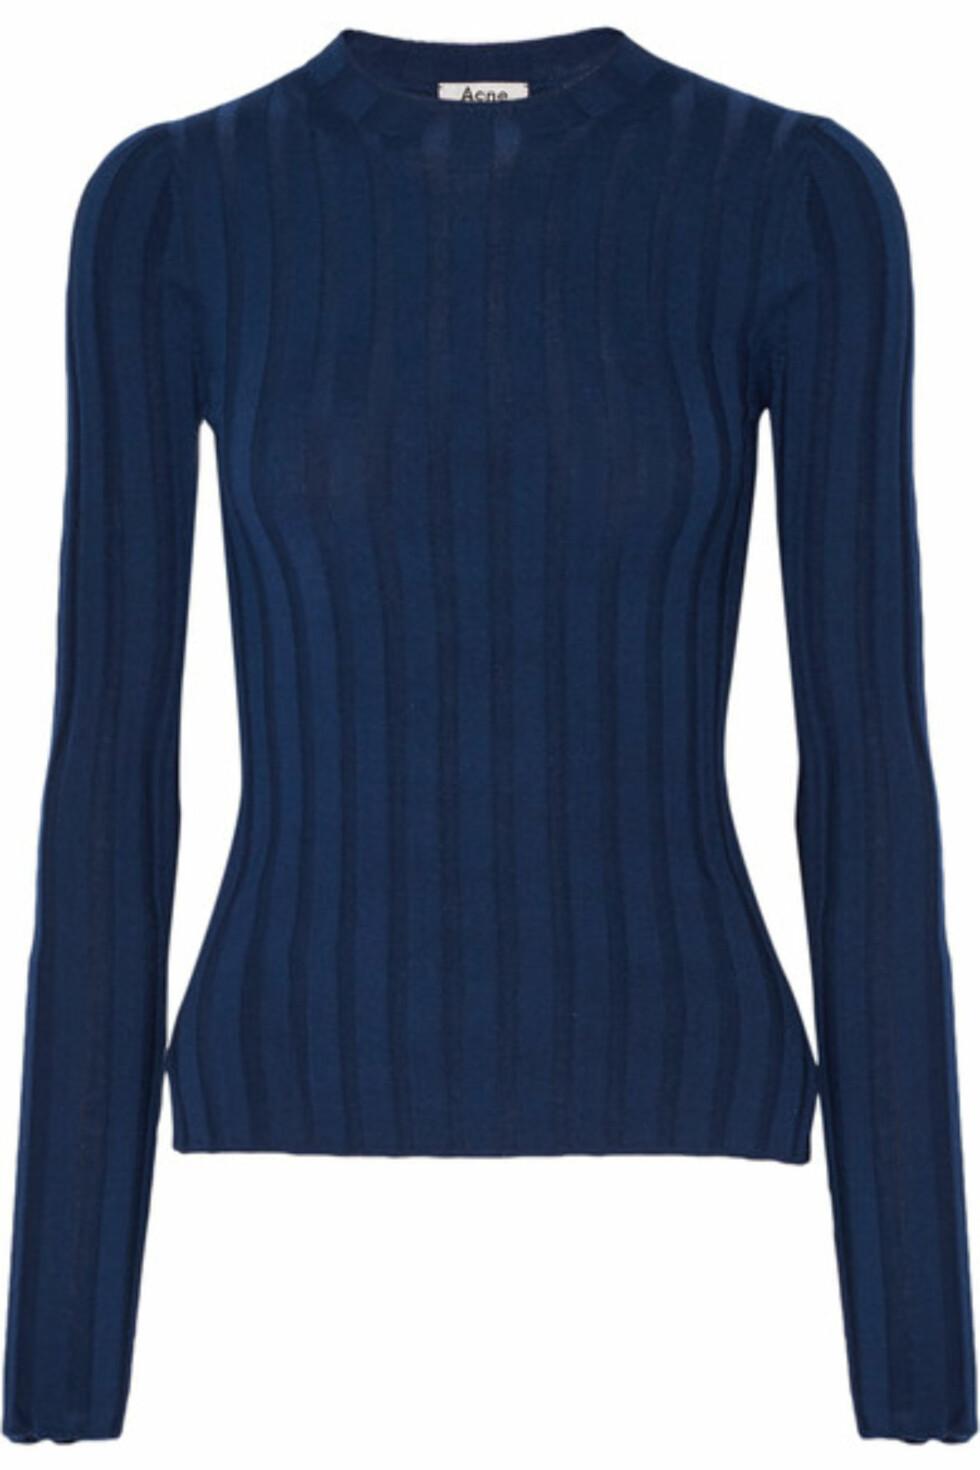 Genser fra Acne Studios via Net-a-porter.com | kr 2552 | https://www.net-a-porter.com/no/en/product/730775/Acne_Studios/carin-ribbed-merino-wool-blend-sweater